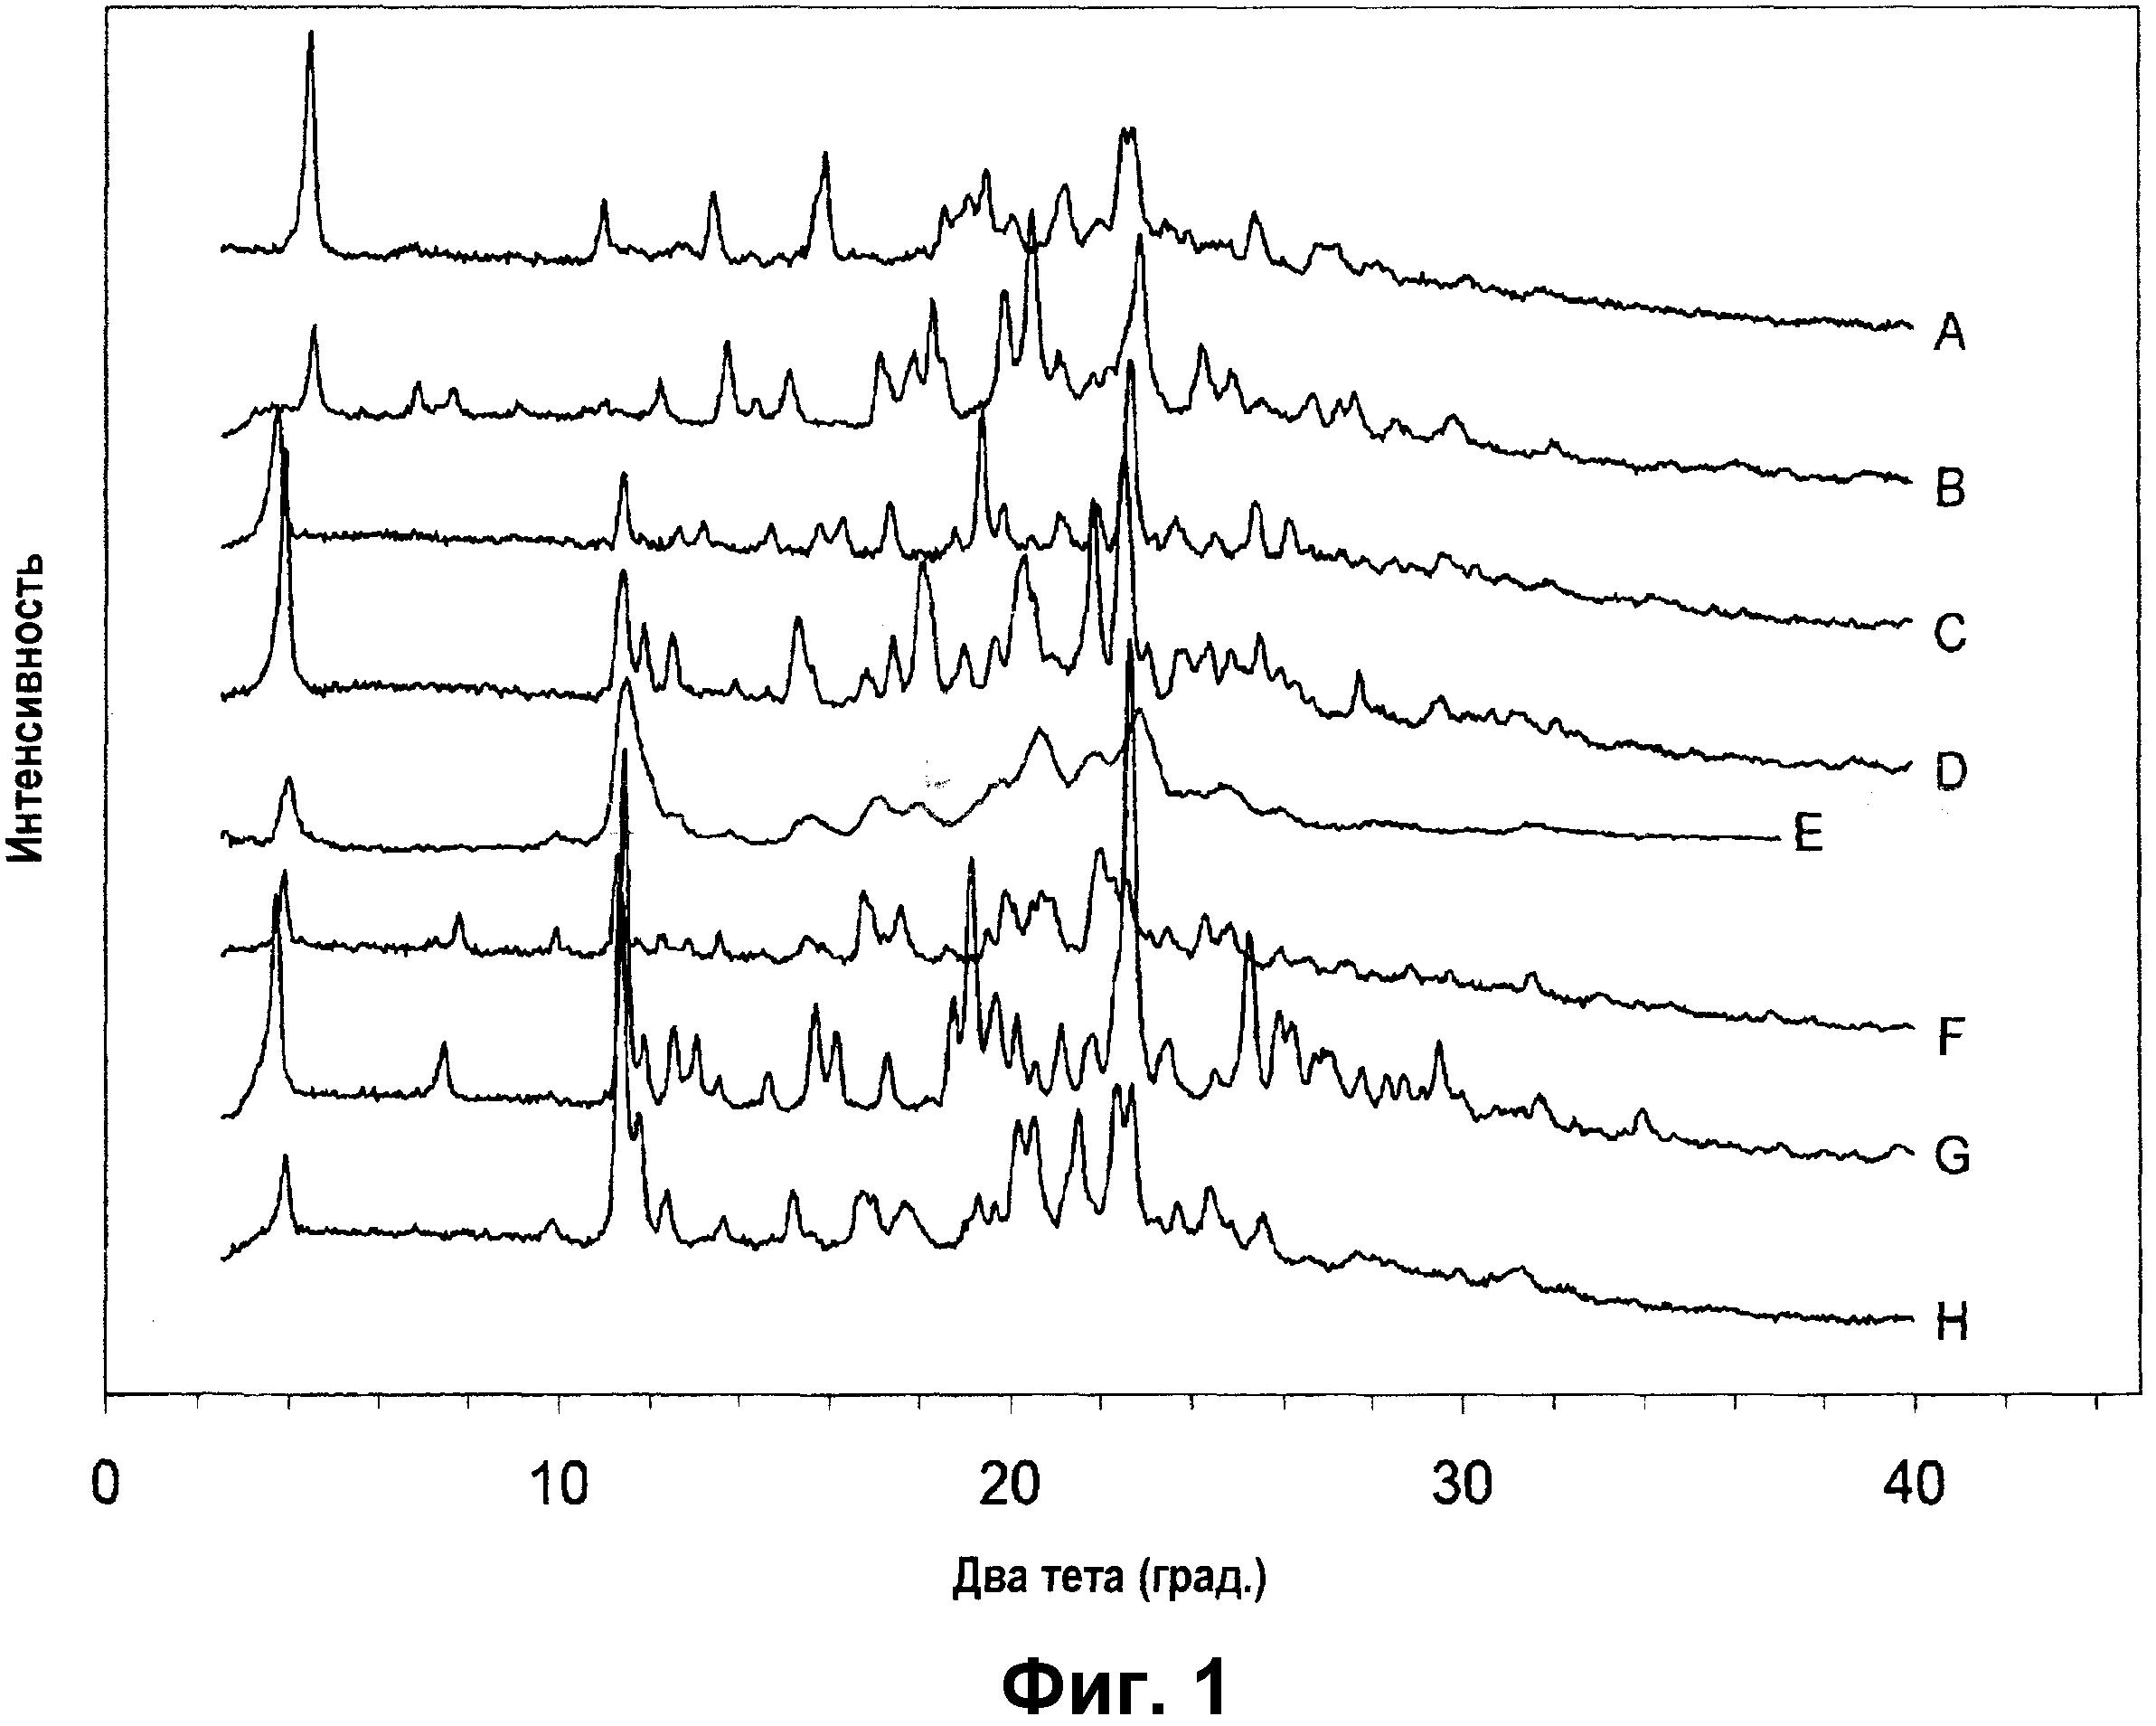 Кристаллическая форма 4-[5-[3-хлор-5-(трифторметил)фенил]-4,5-дигидро-5-(трифторметил)-3-изоксазолил]-n-[2-оксо-2-[(2,2,2-трифторэтил)амино]этил]-1-нафталинкарбоксамида